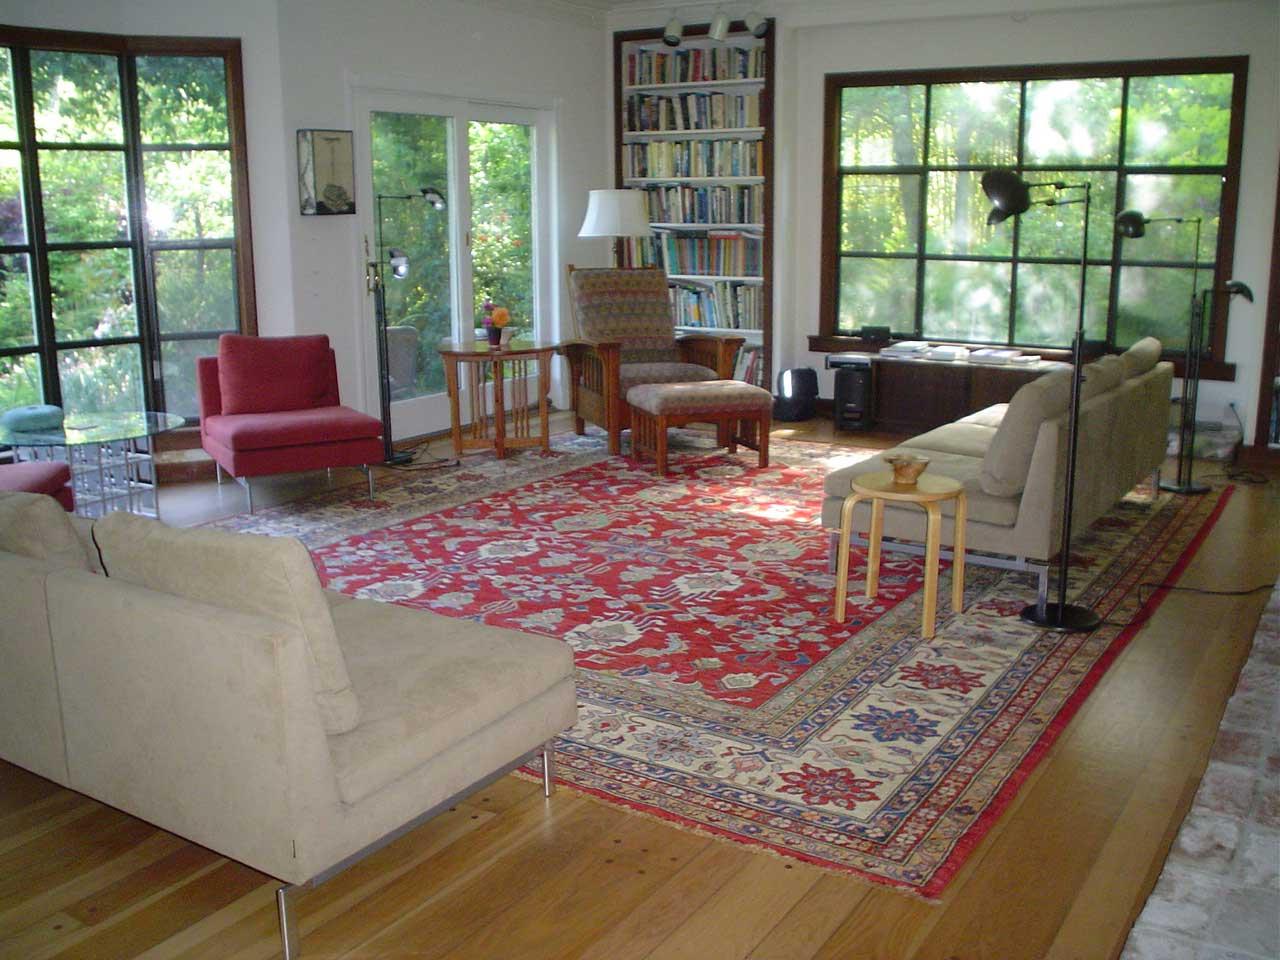 12 x 14 Kazak rug in a client's home, here in Sebastopol, CA.